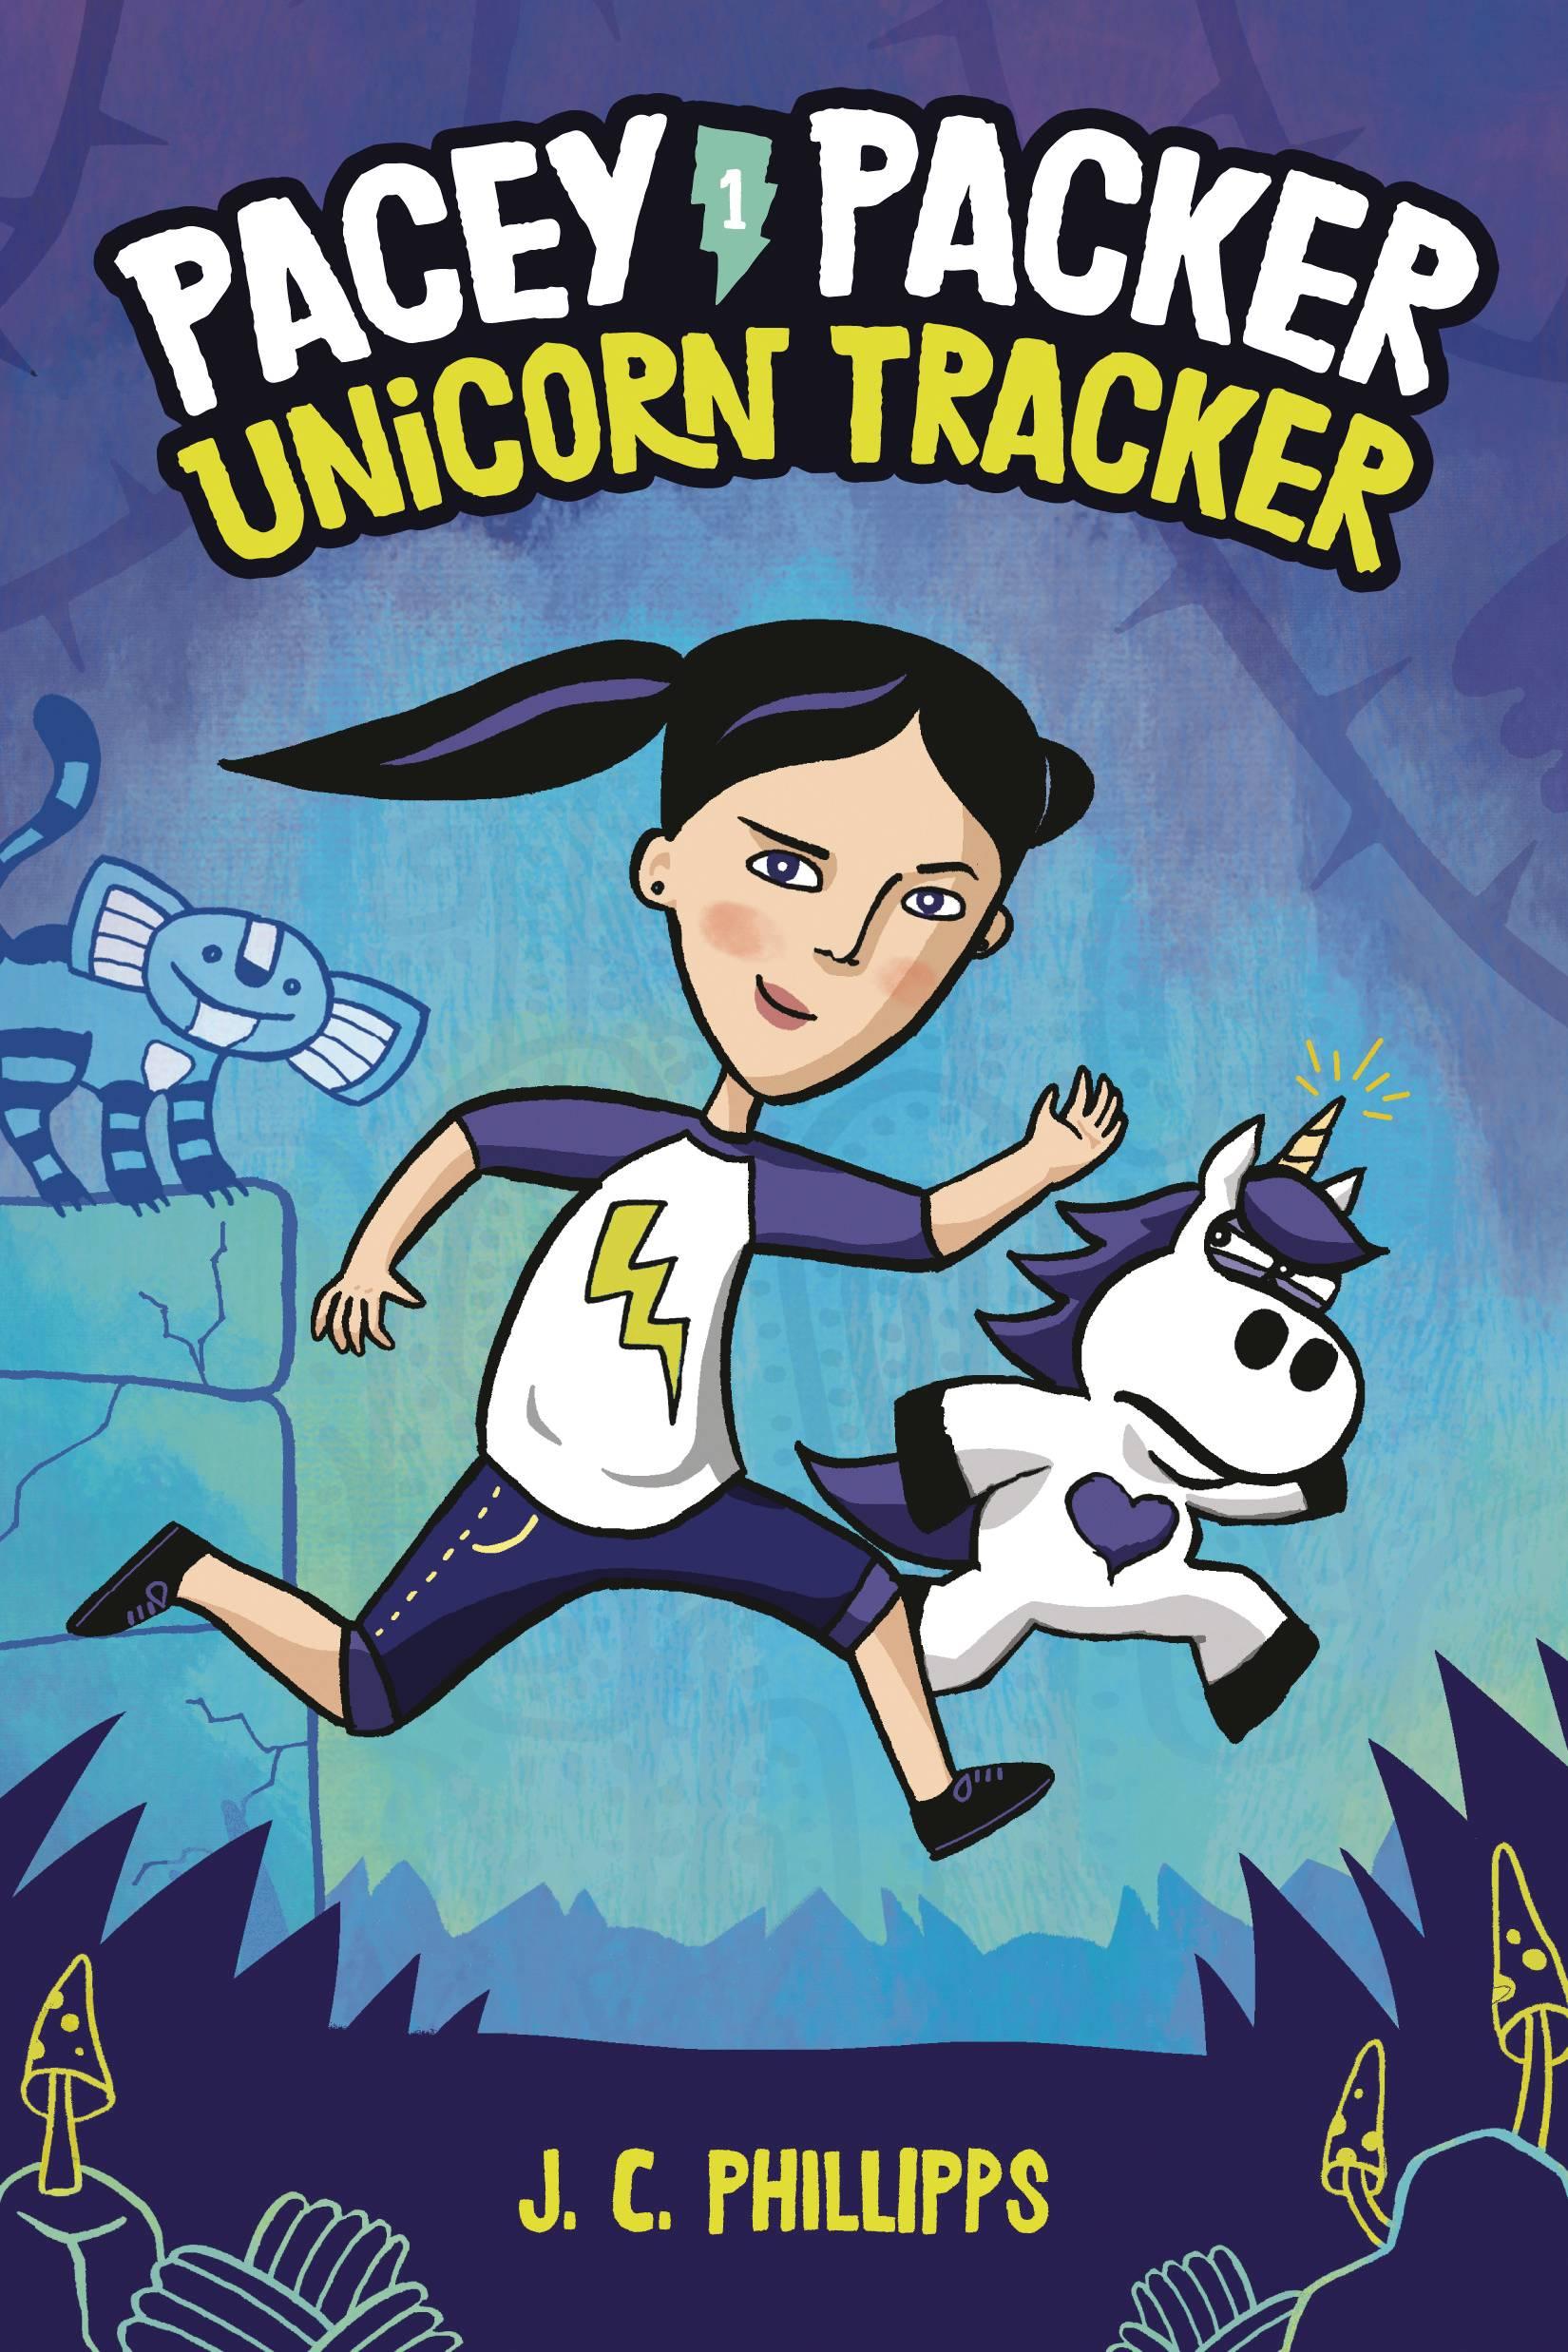 PACEY PACKER UNICORN TRACKER TP 01